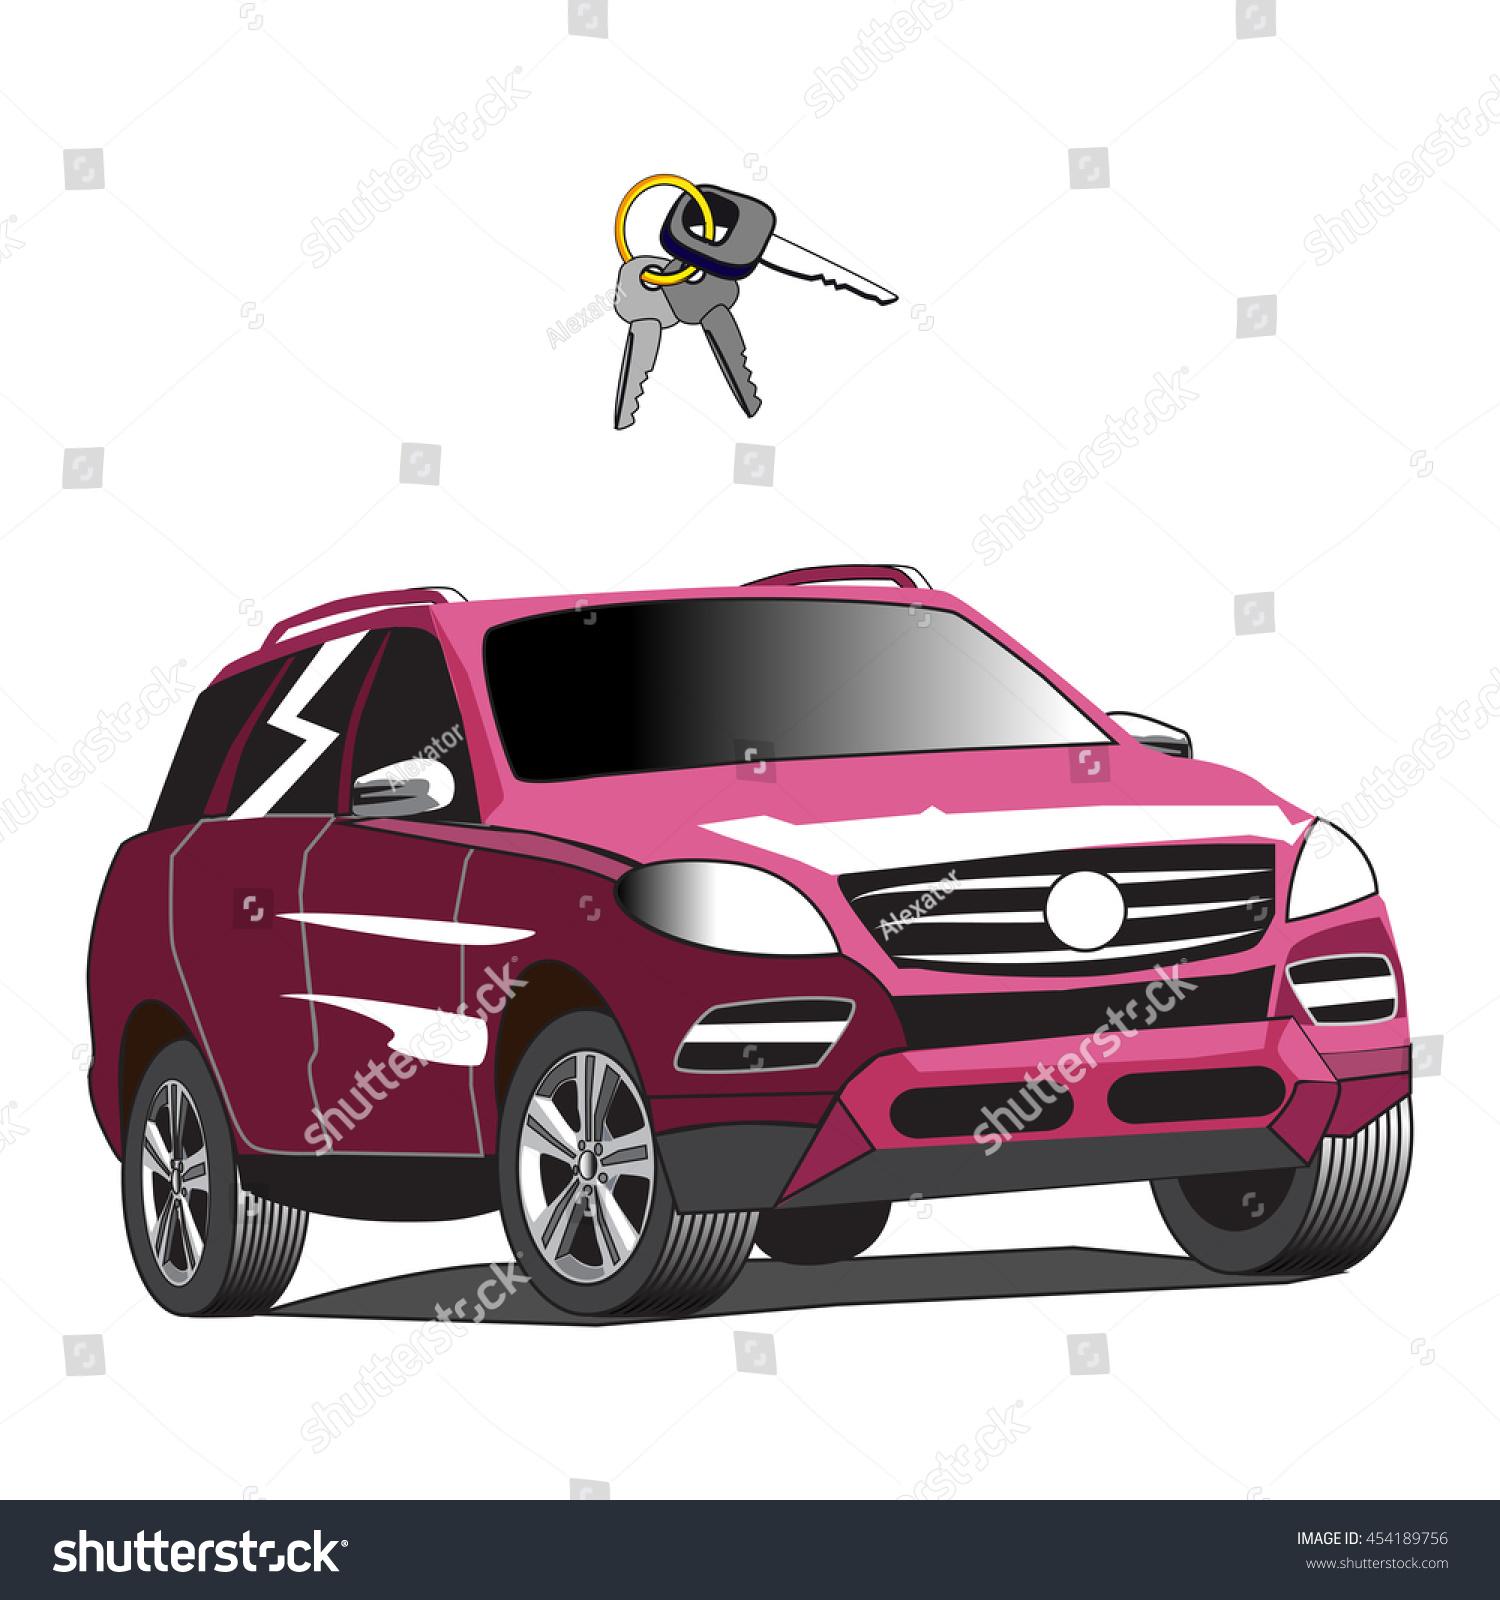 jeep rent ibiza today a car